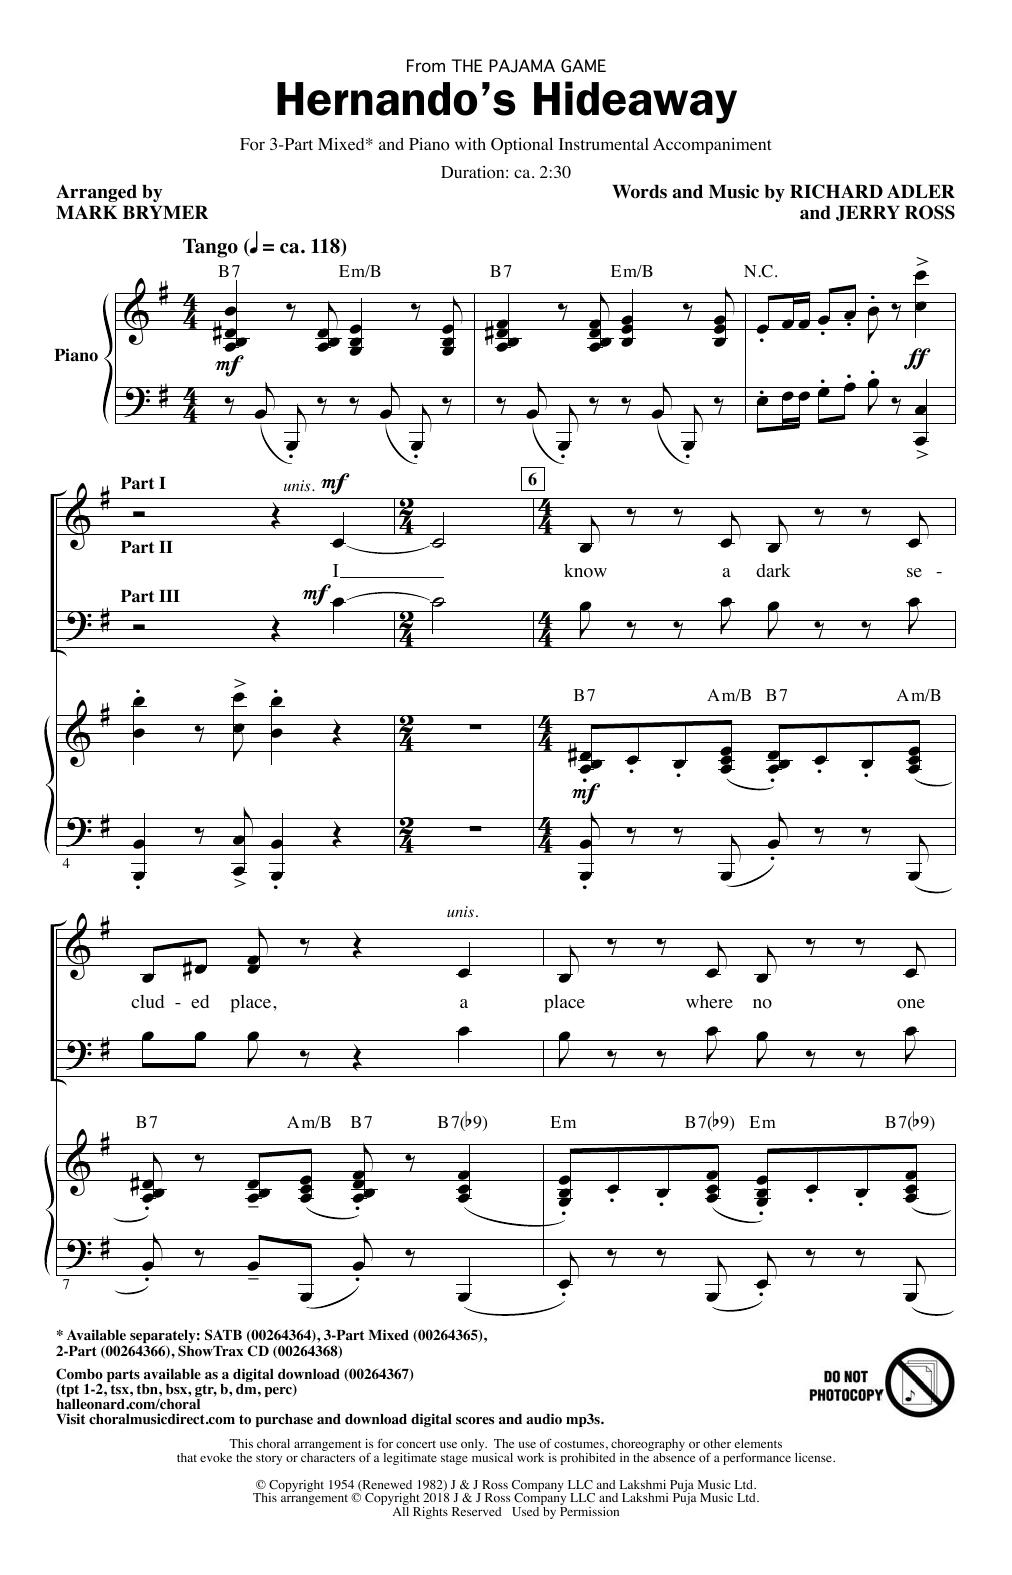 Hernando's Hideaway Sheet Music